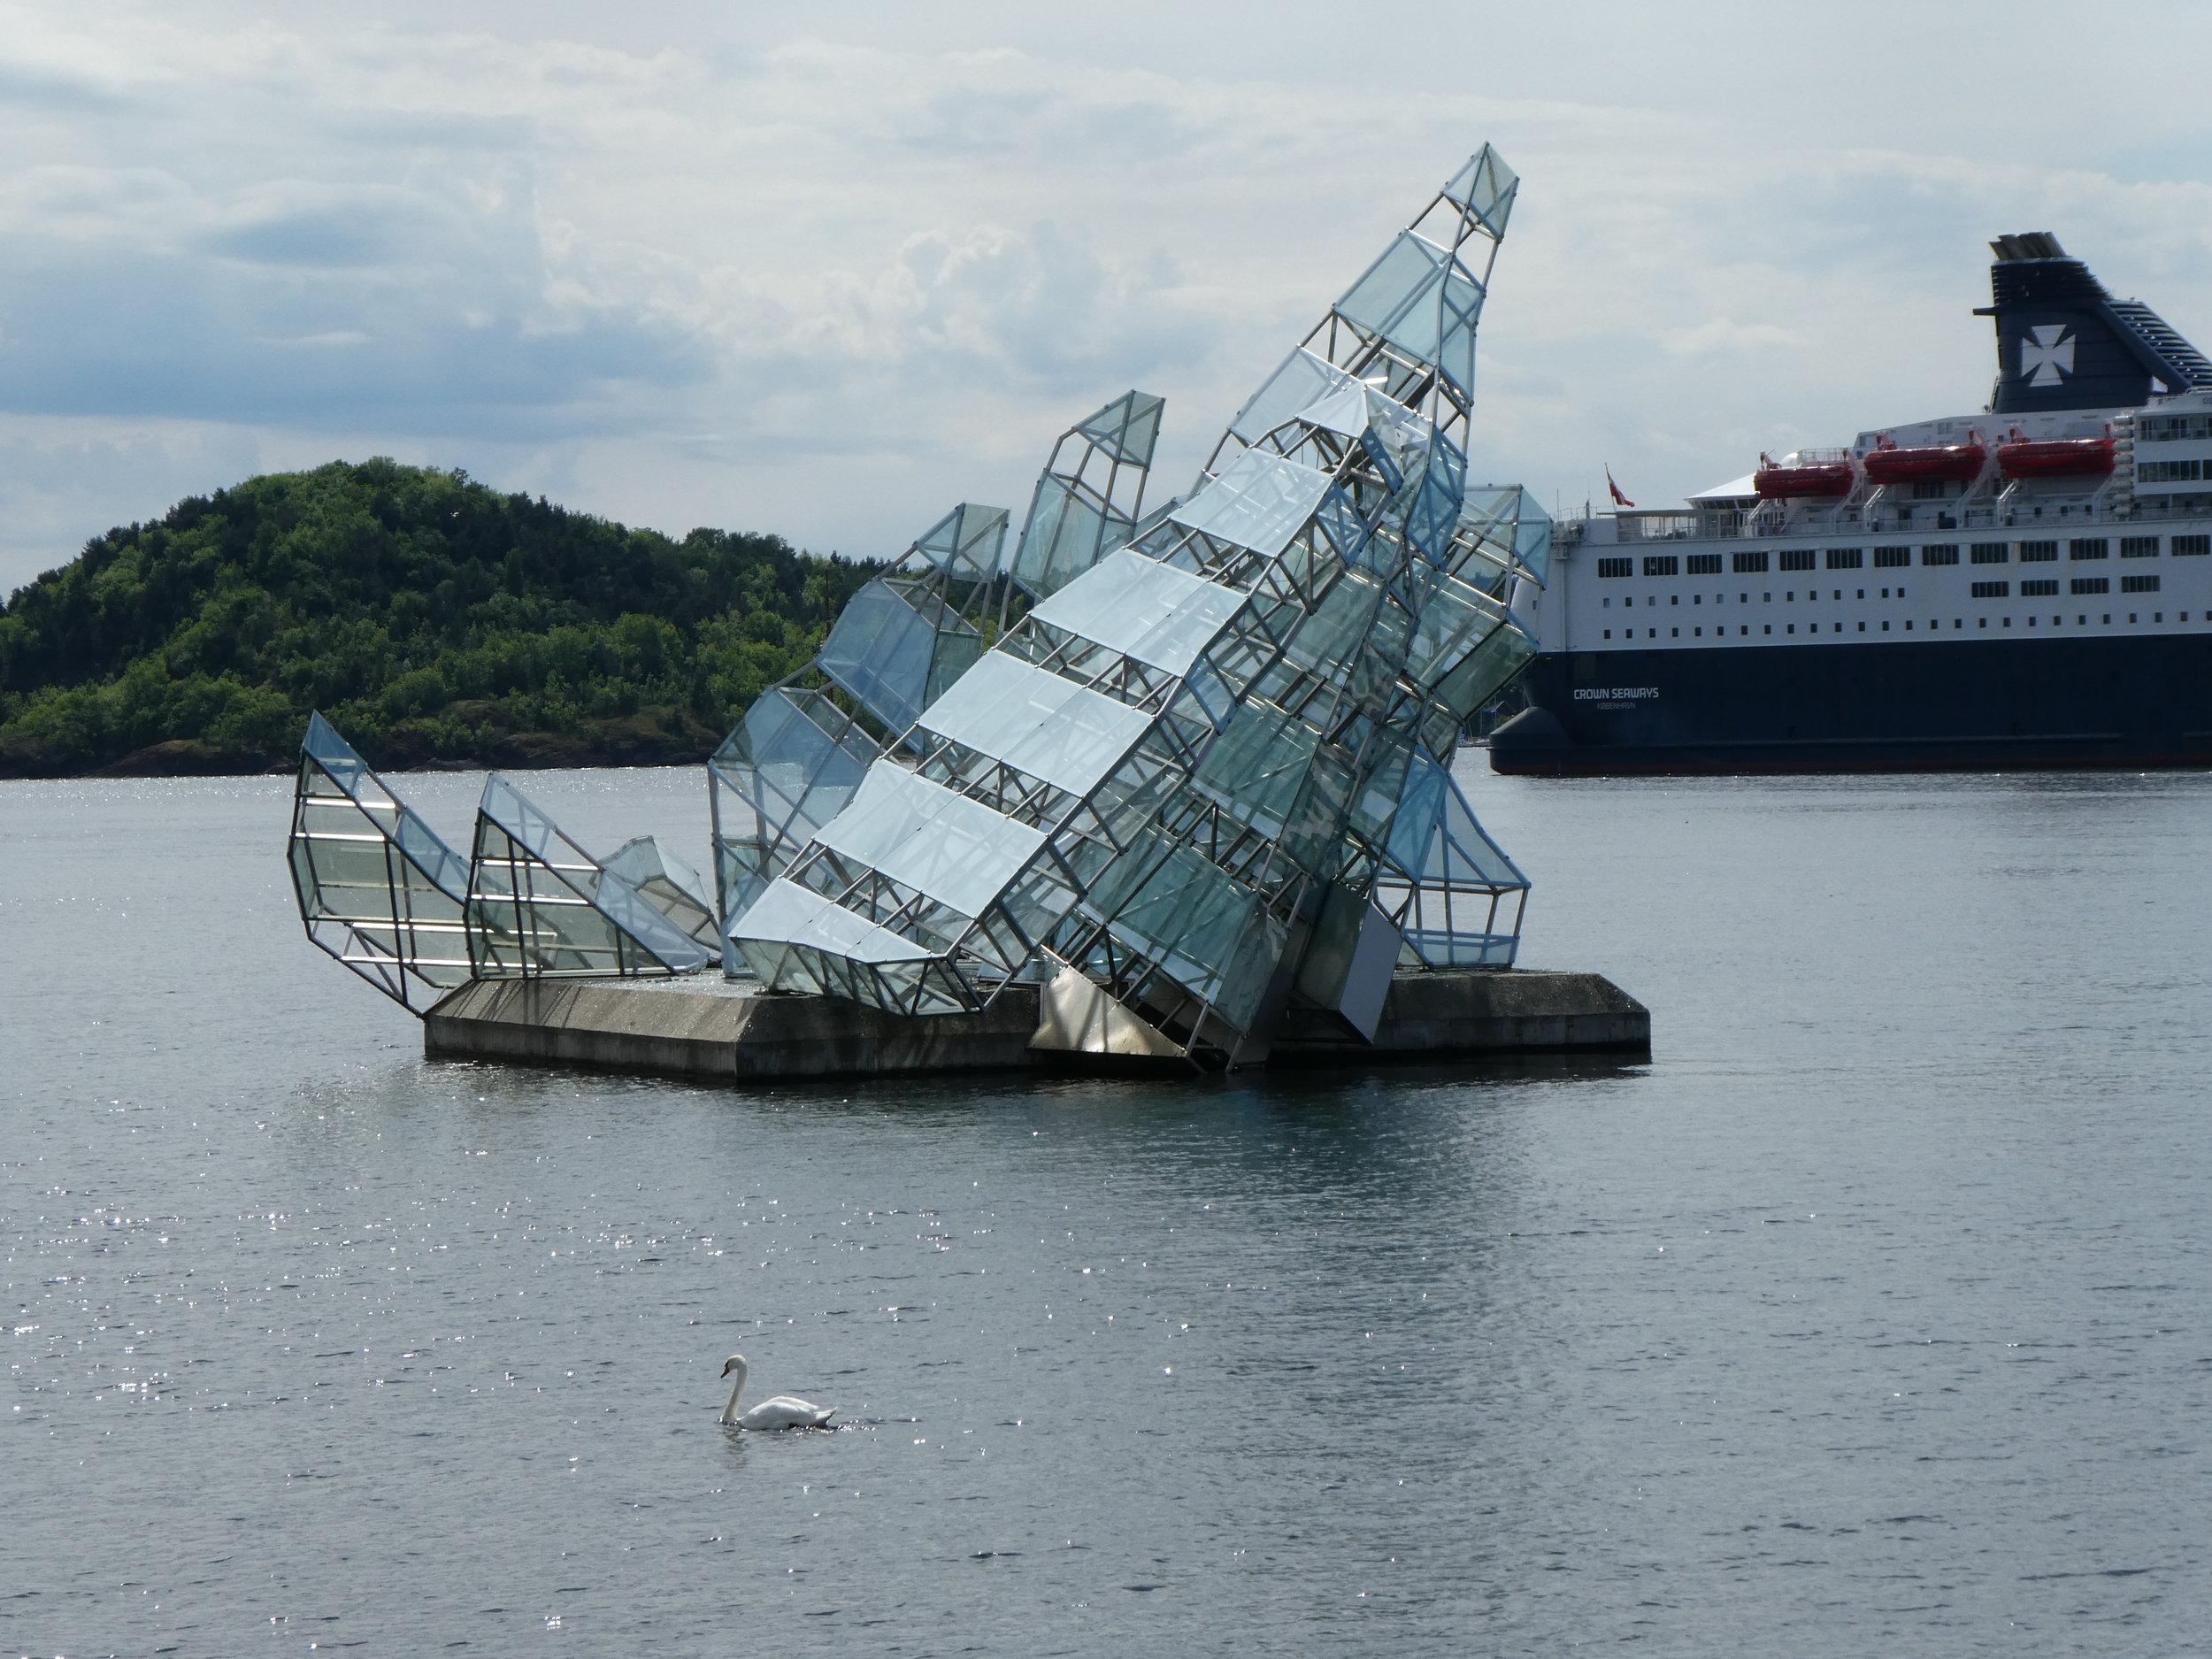 Sculpture in the harbor.